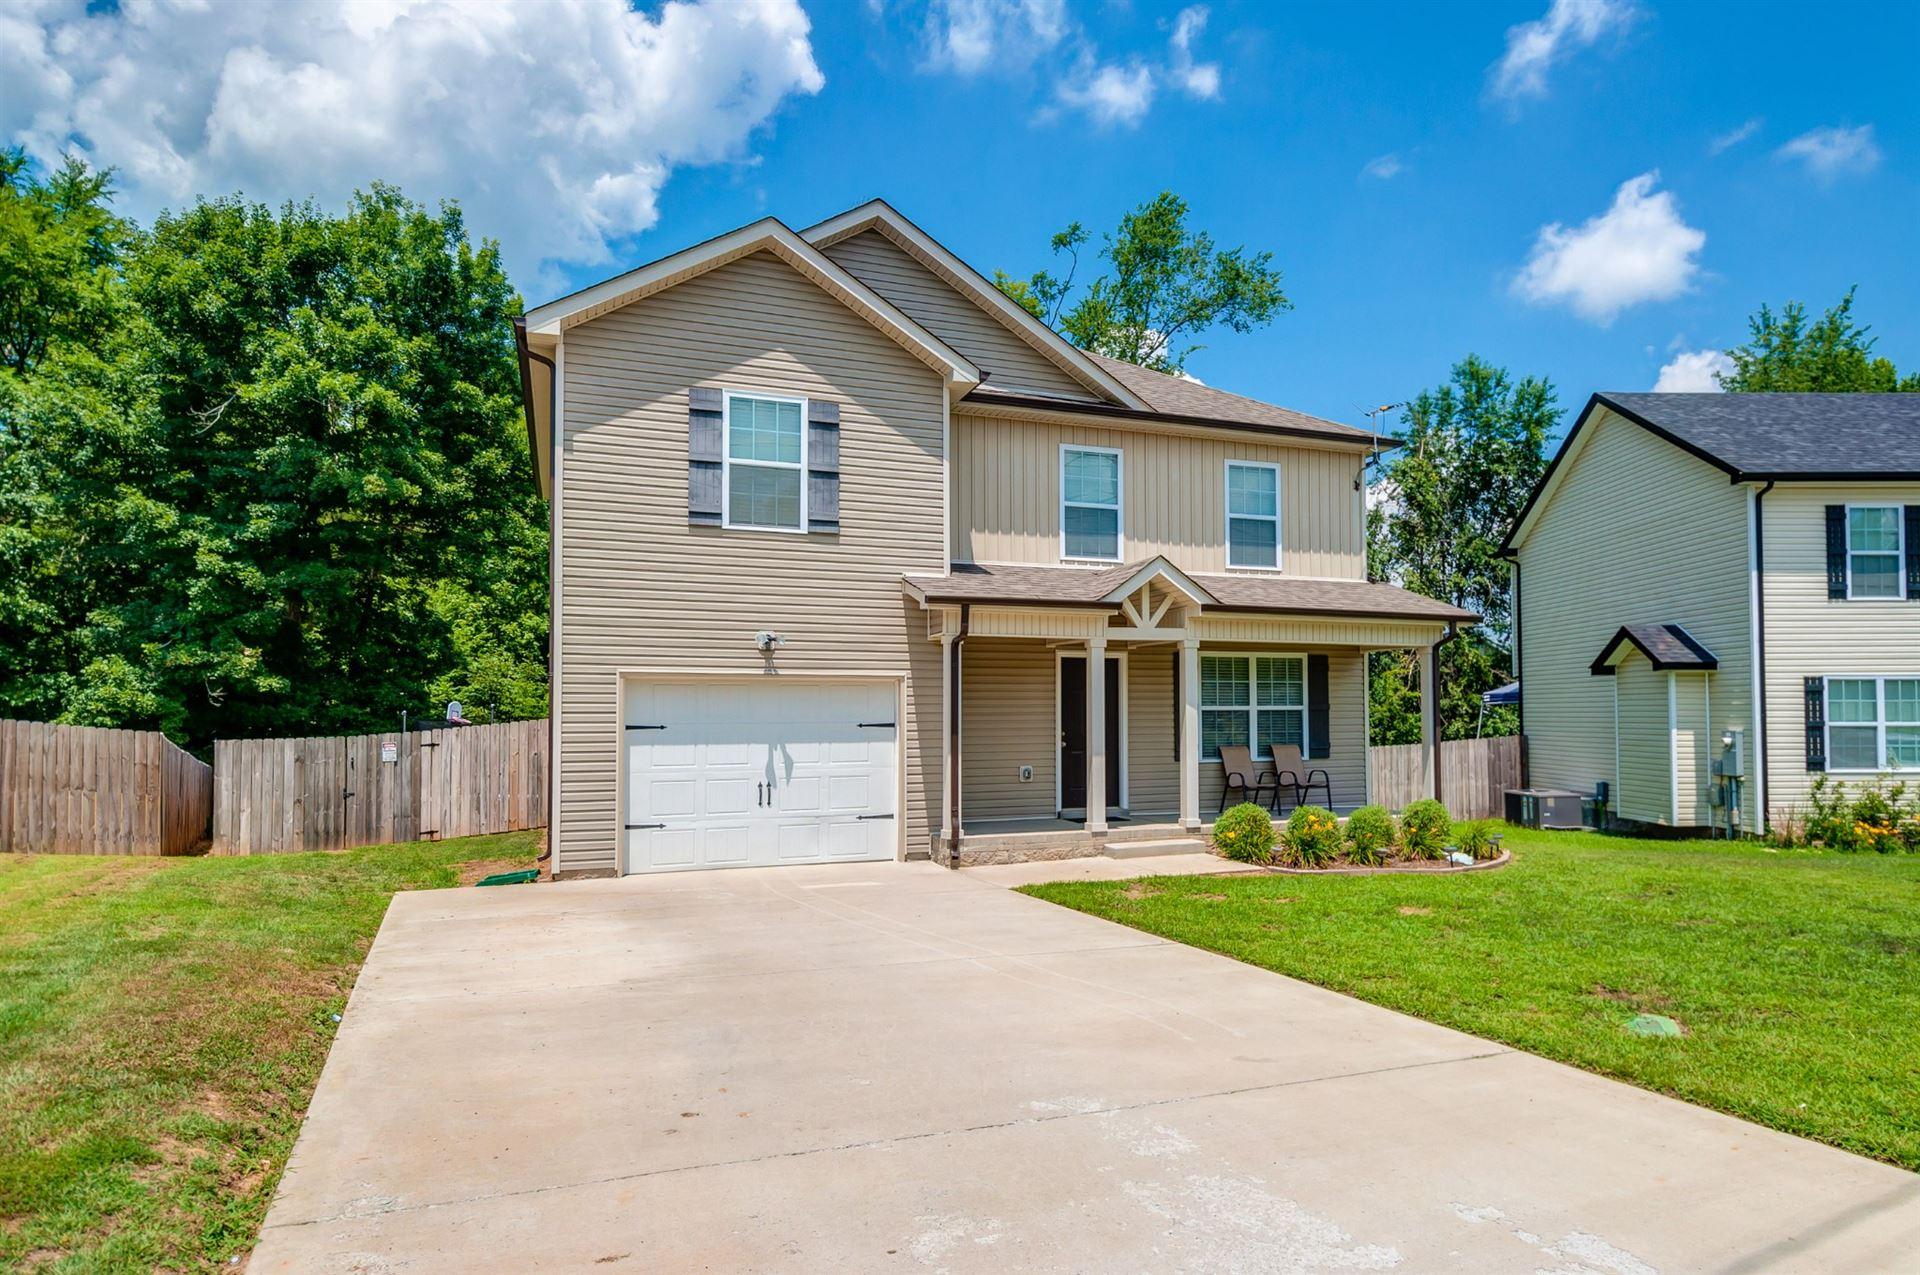 550 Magnolia Dr, Clarksville, TN 37042 - MLS#: 2187653